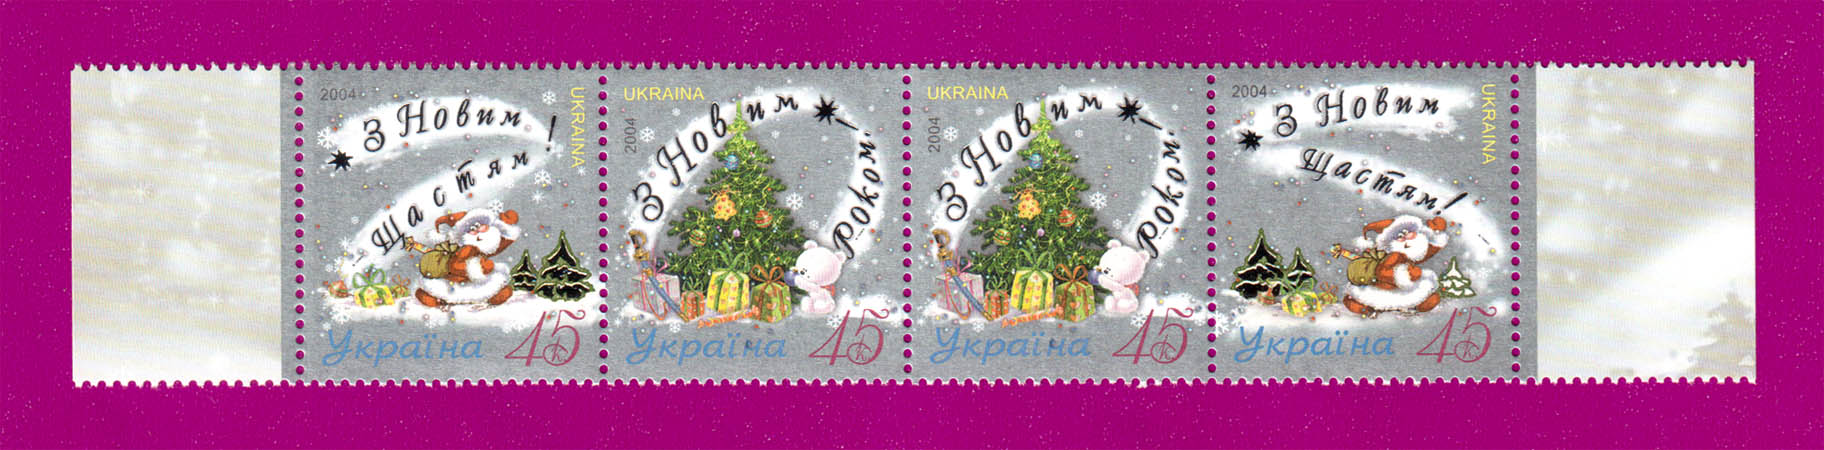 2004 сцепка Новый год Украина